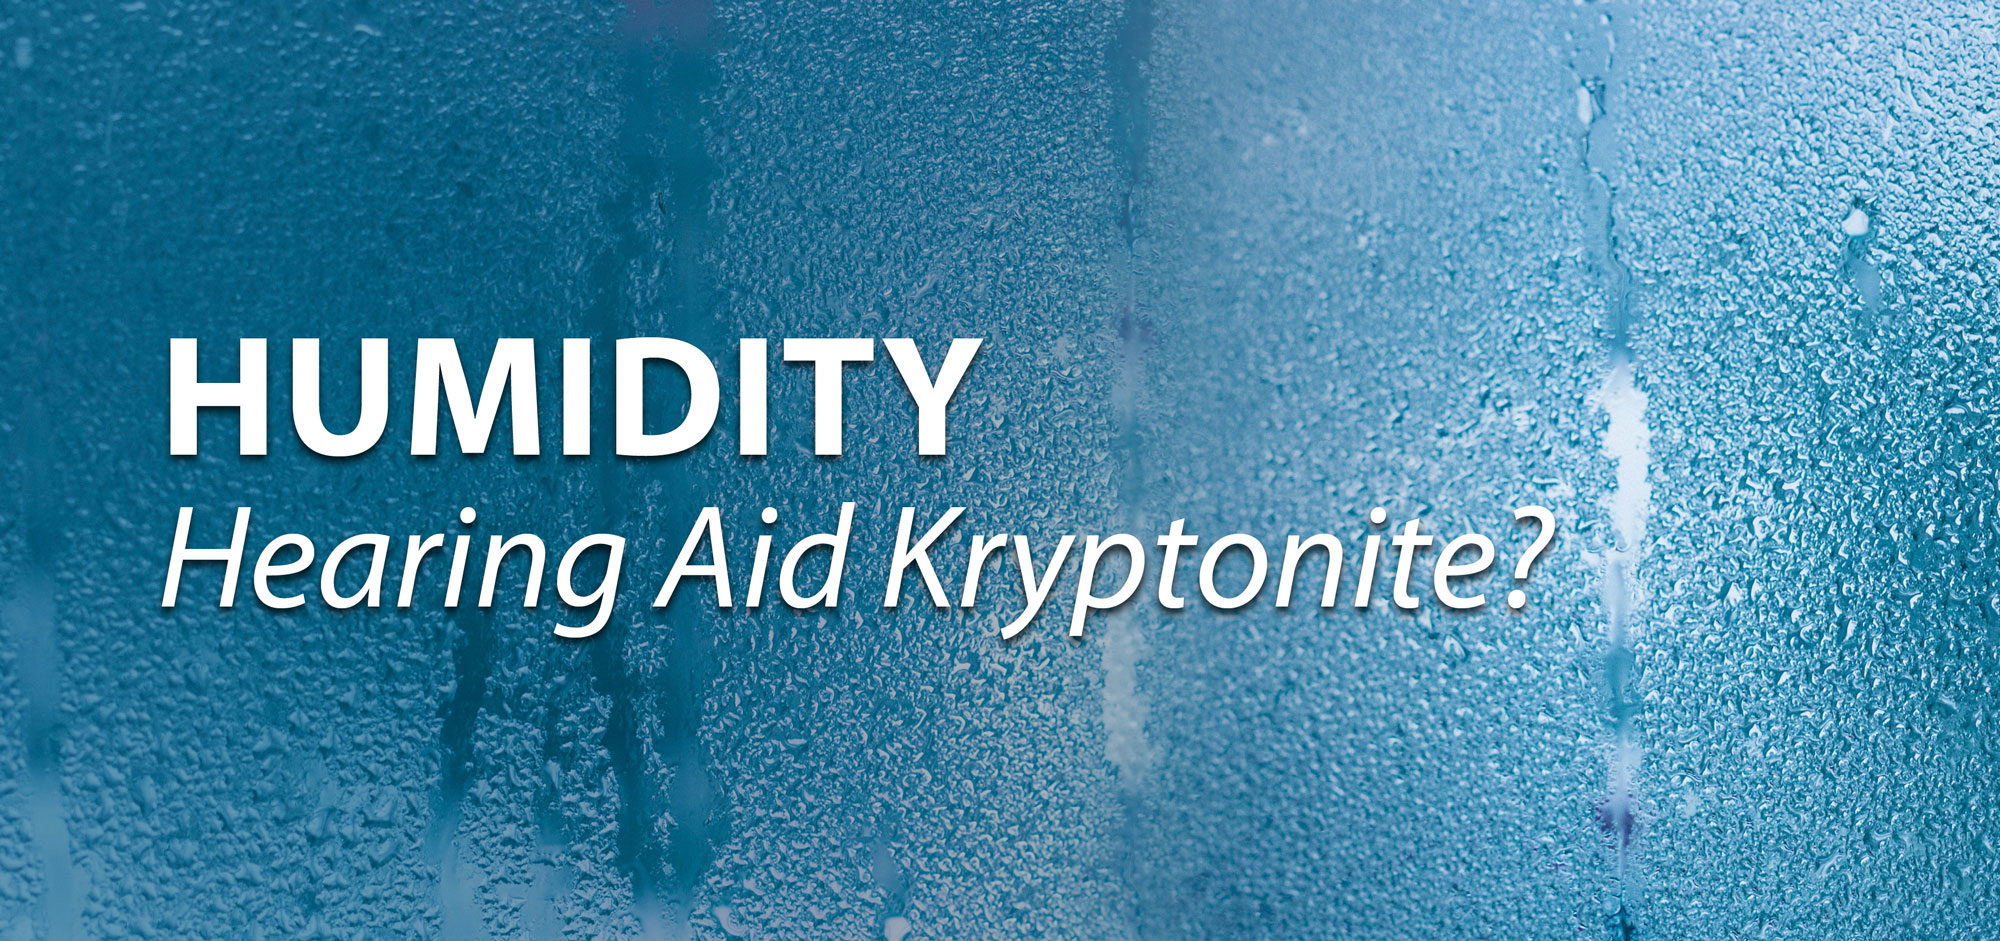 Humidity — Hearing Aid Kryptonite?